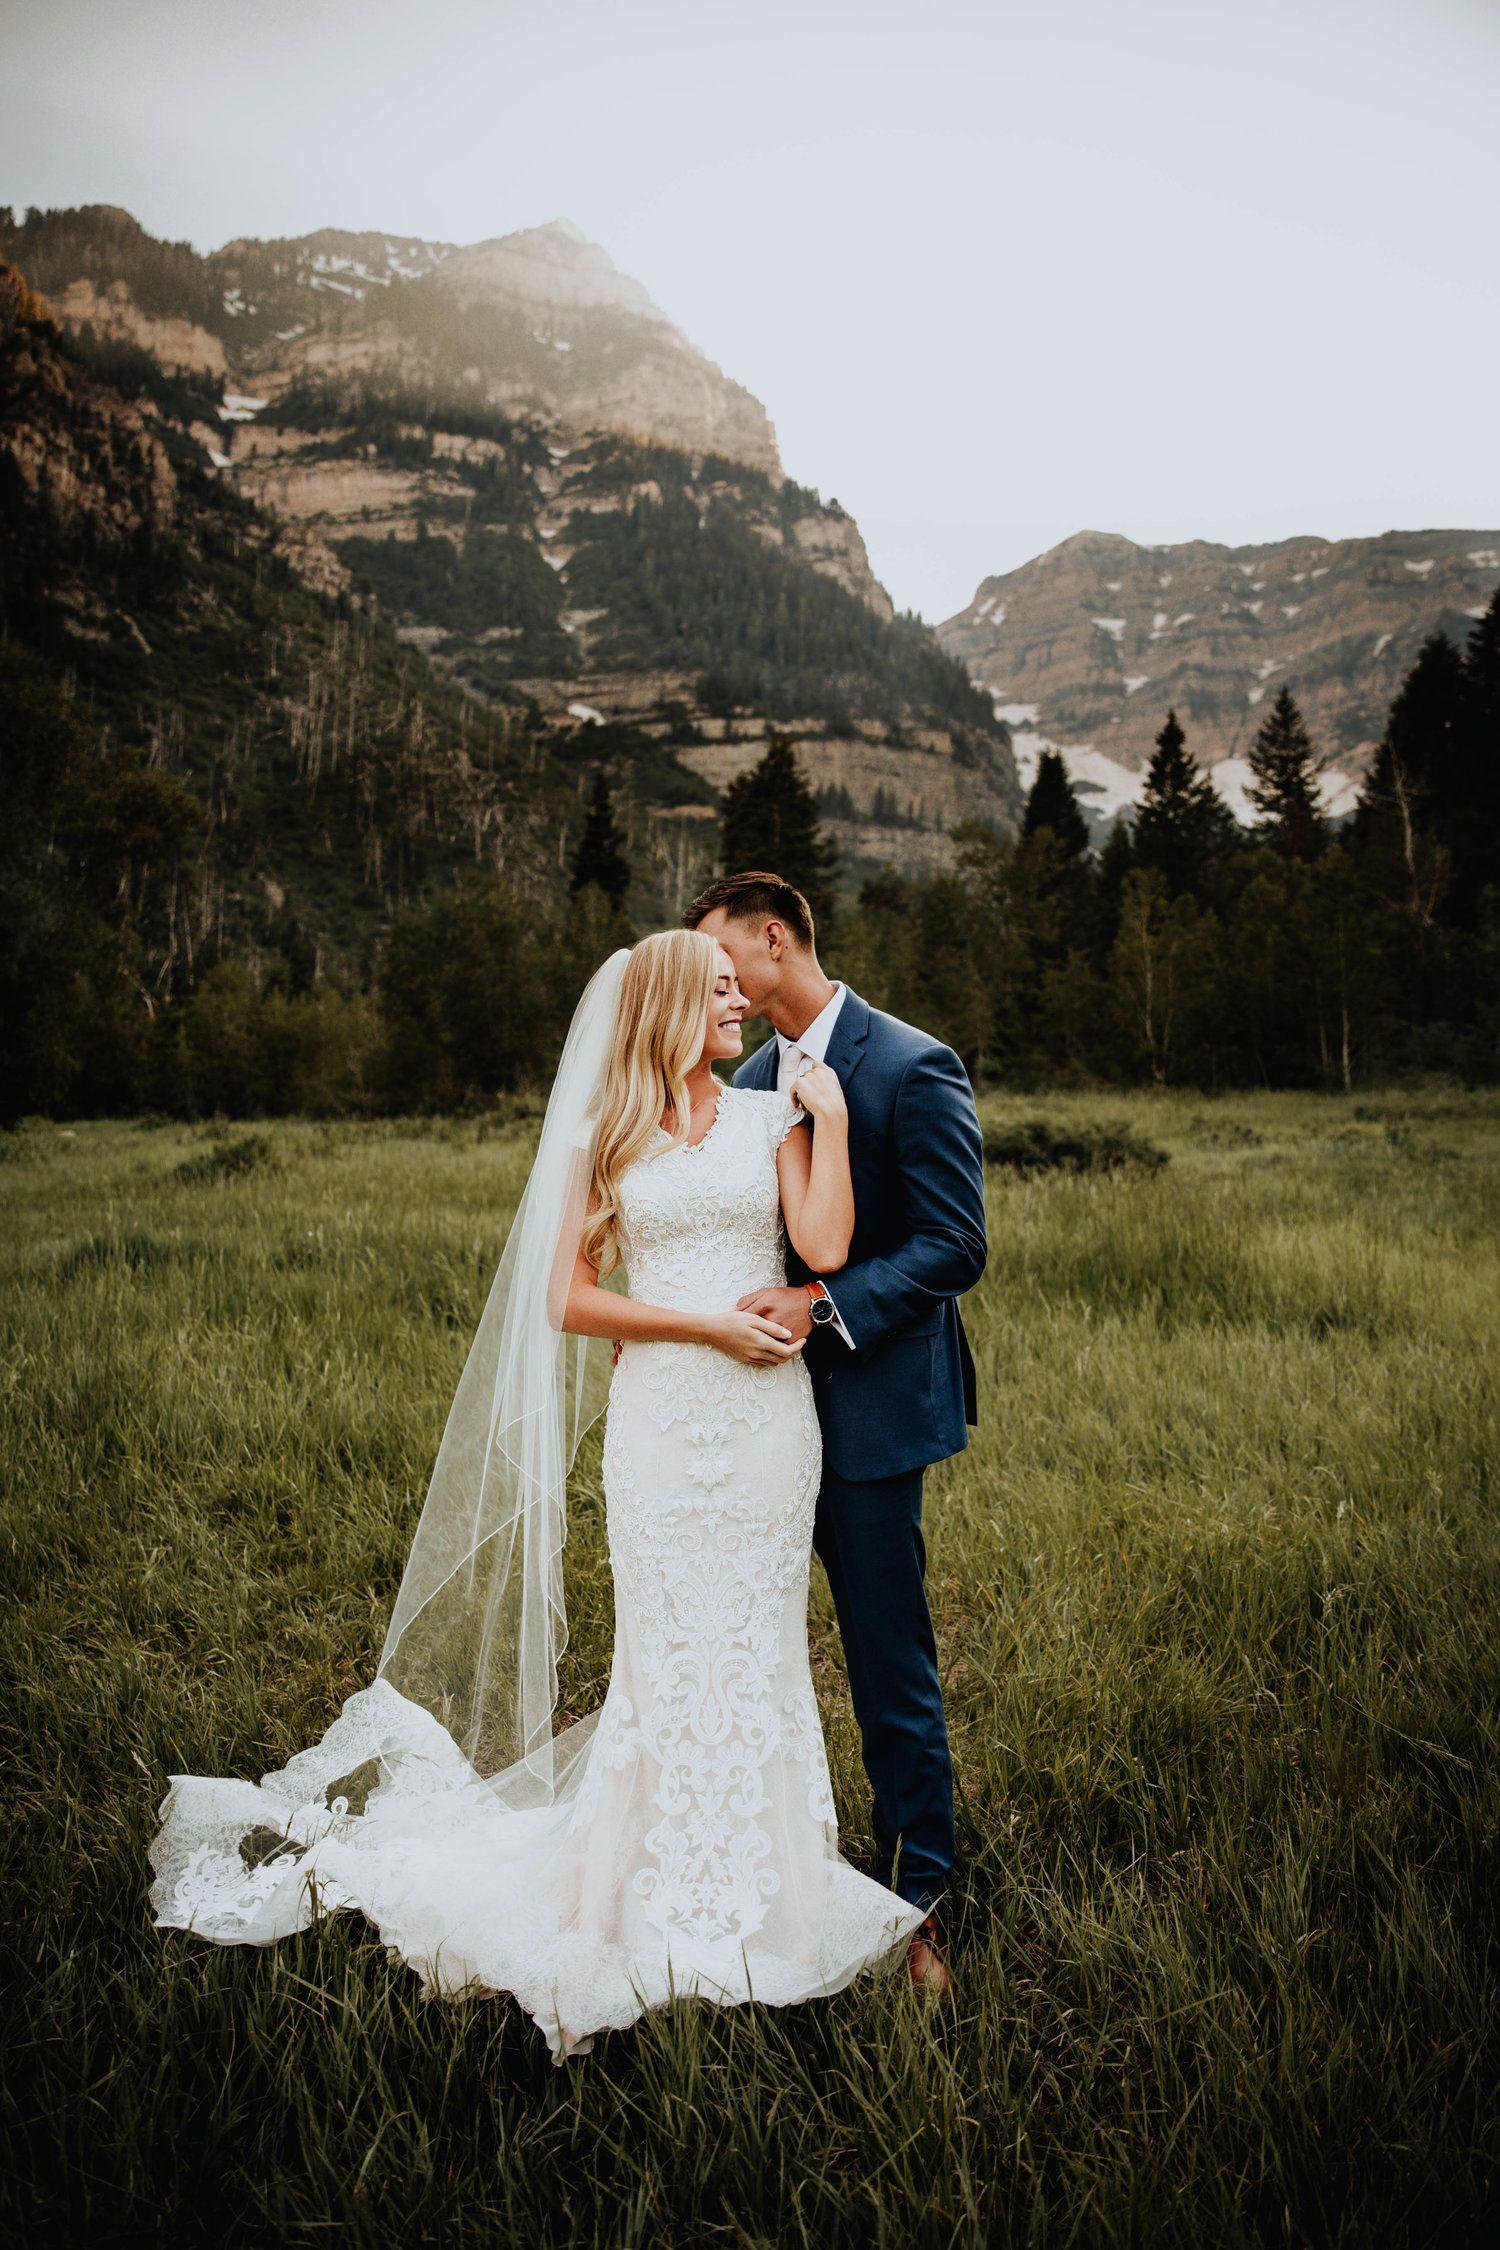 Modest wedding dress with cap sleeves from alta moda modest